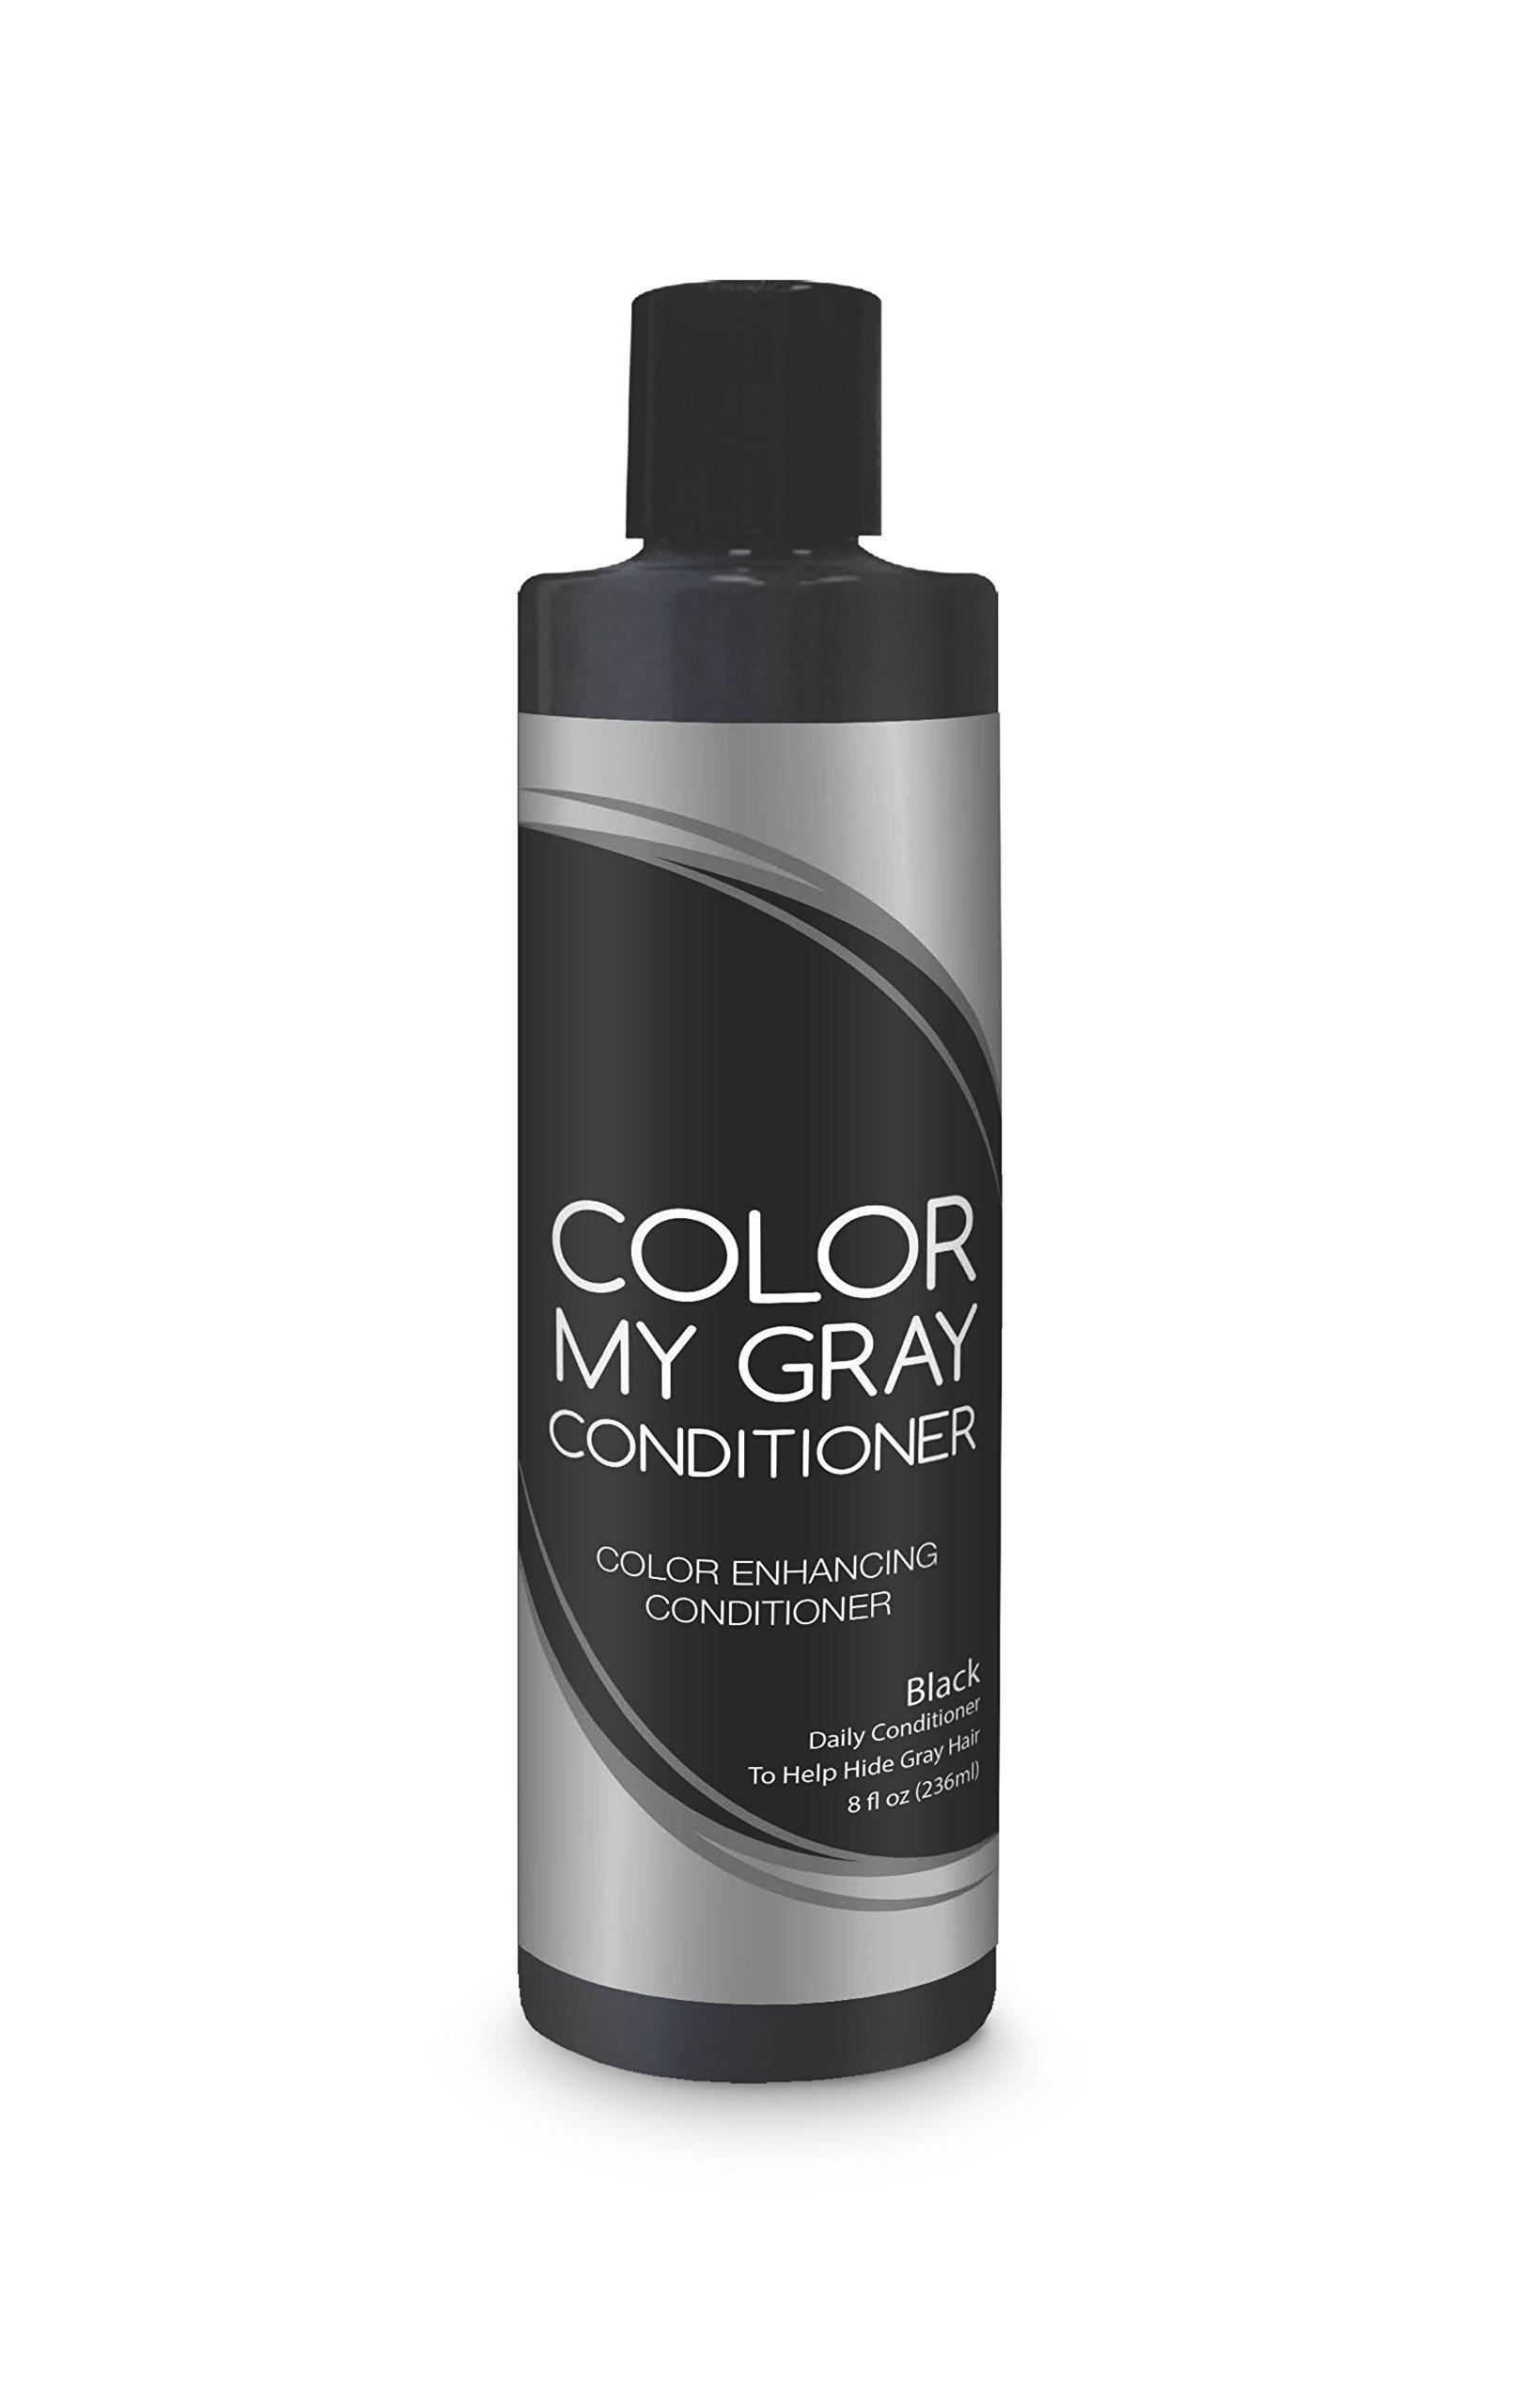 Cheap Loreal Hair Color Shades Find Loreal Hair Color Shades Deals